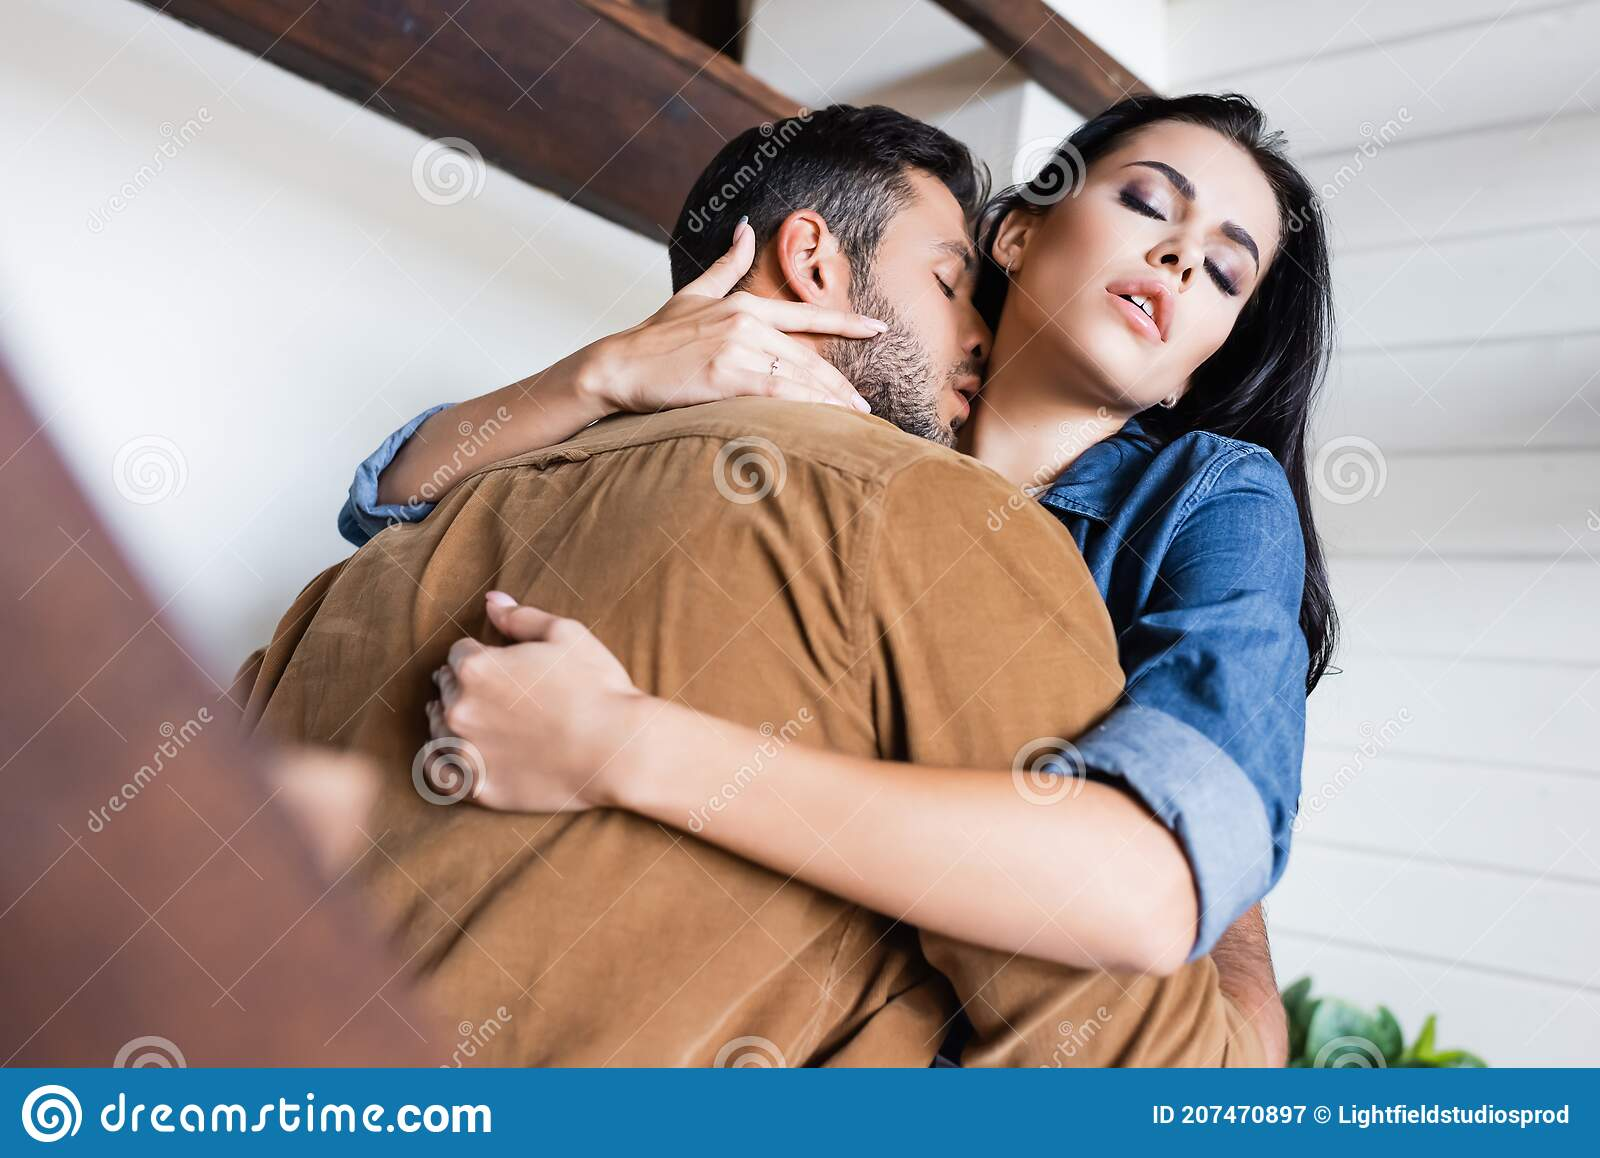 Kisses neck my boyfriend when my What Does